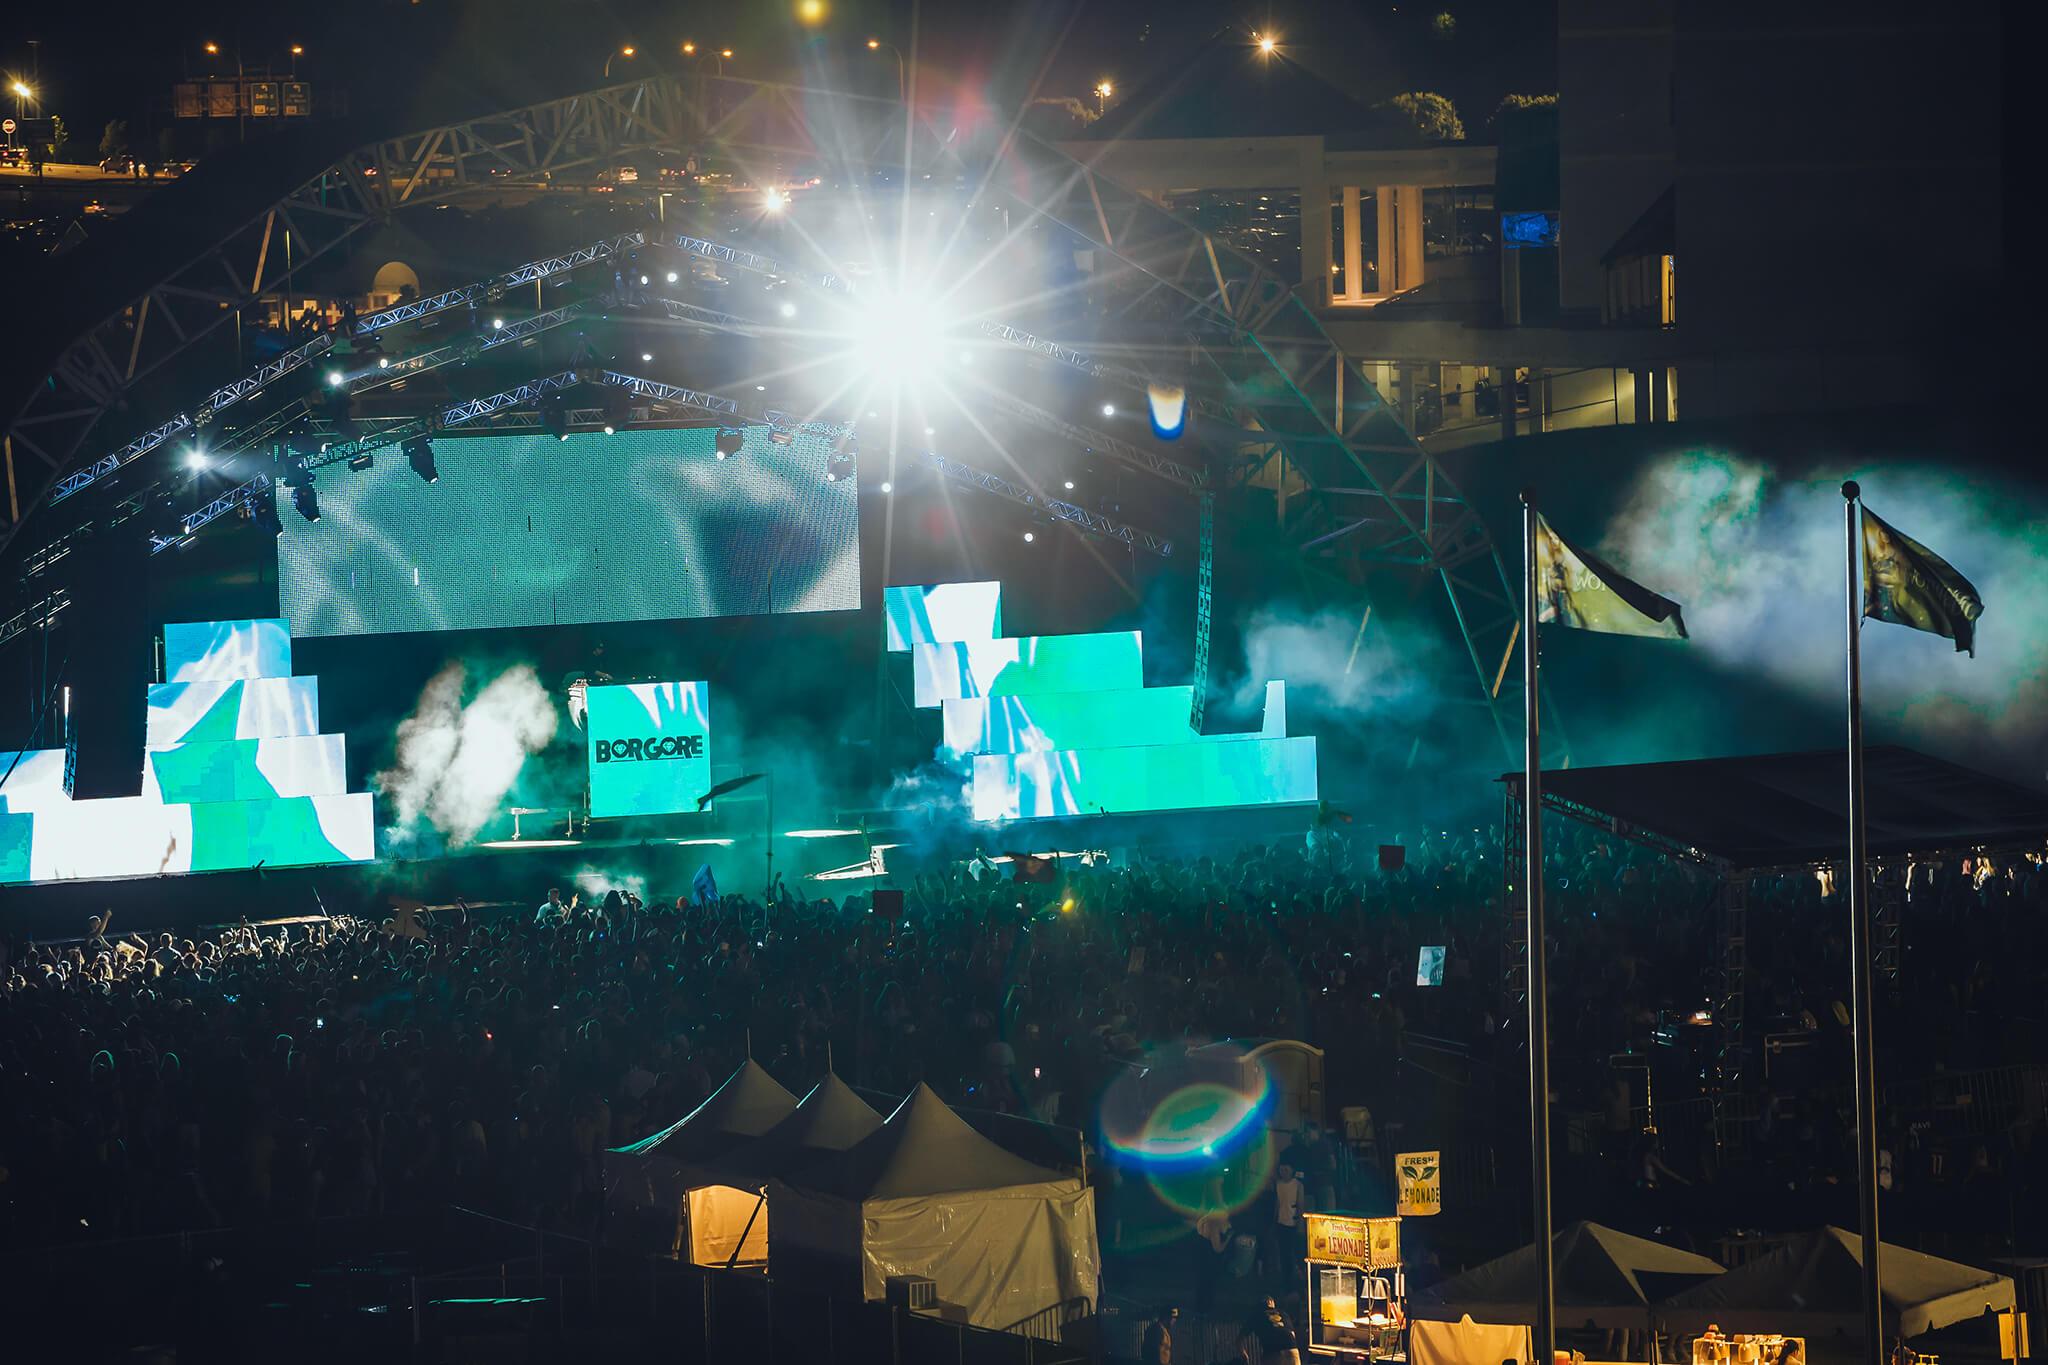 borgore stage at something wonderful festival